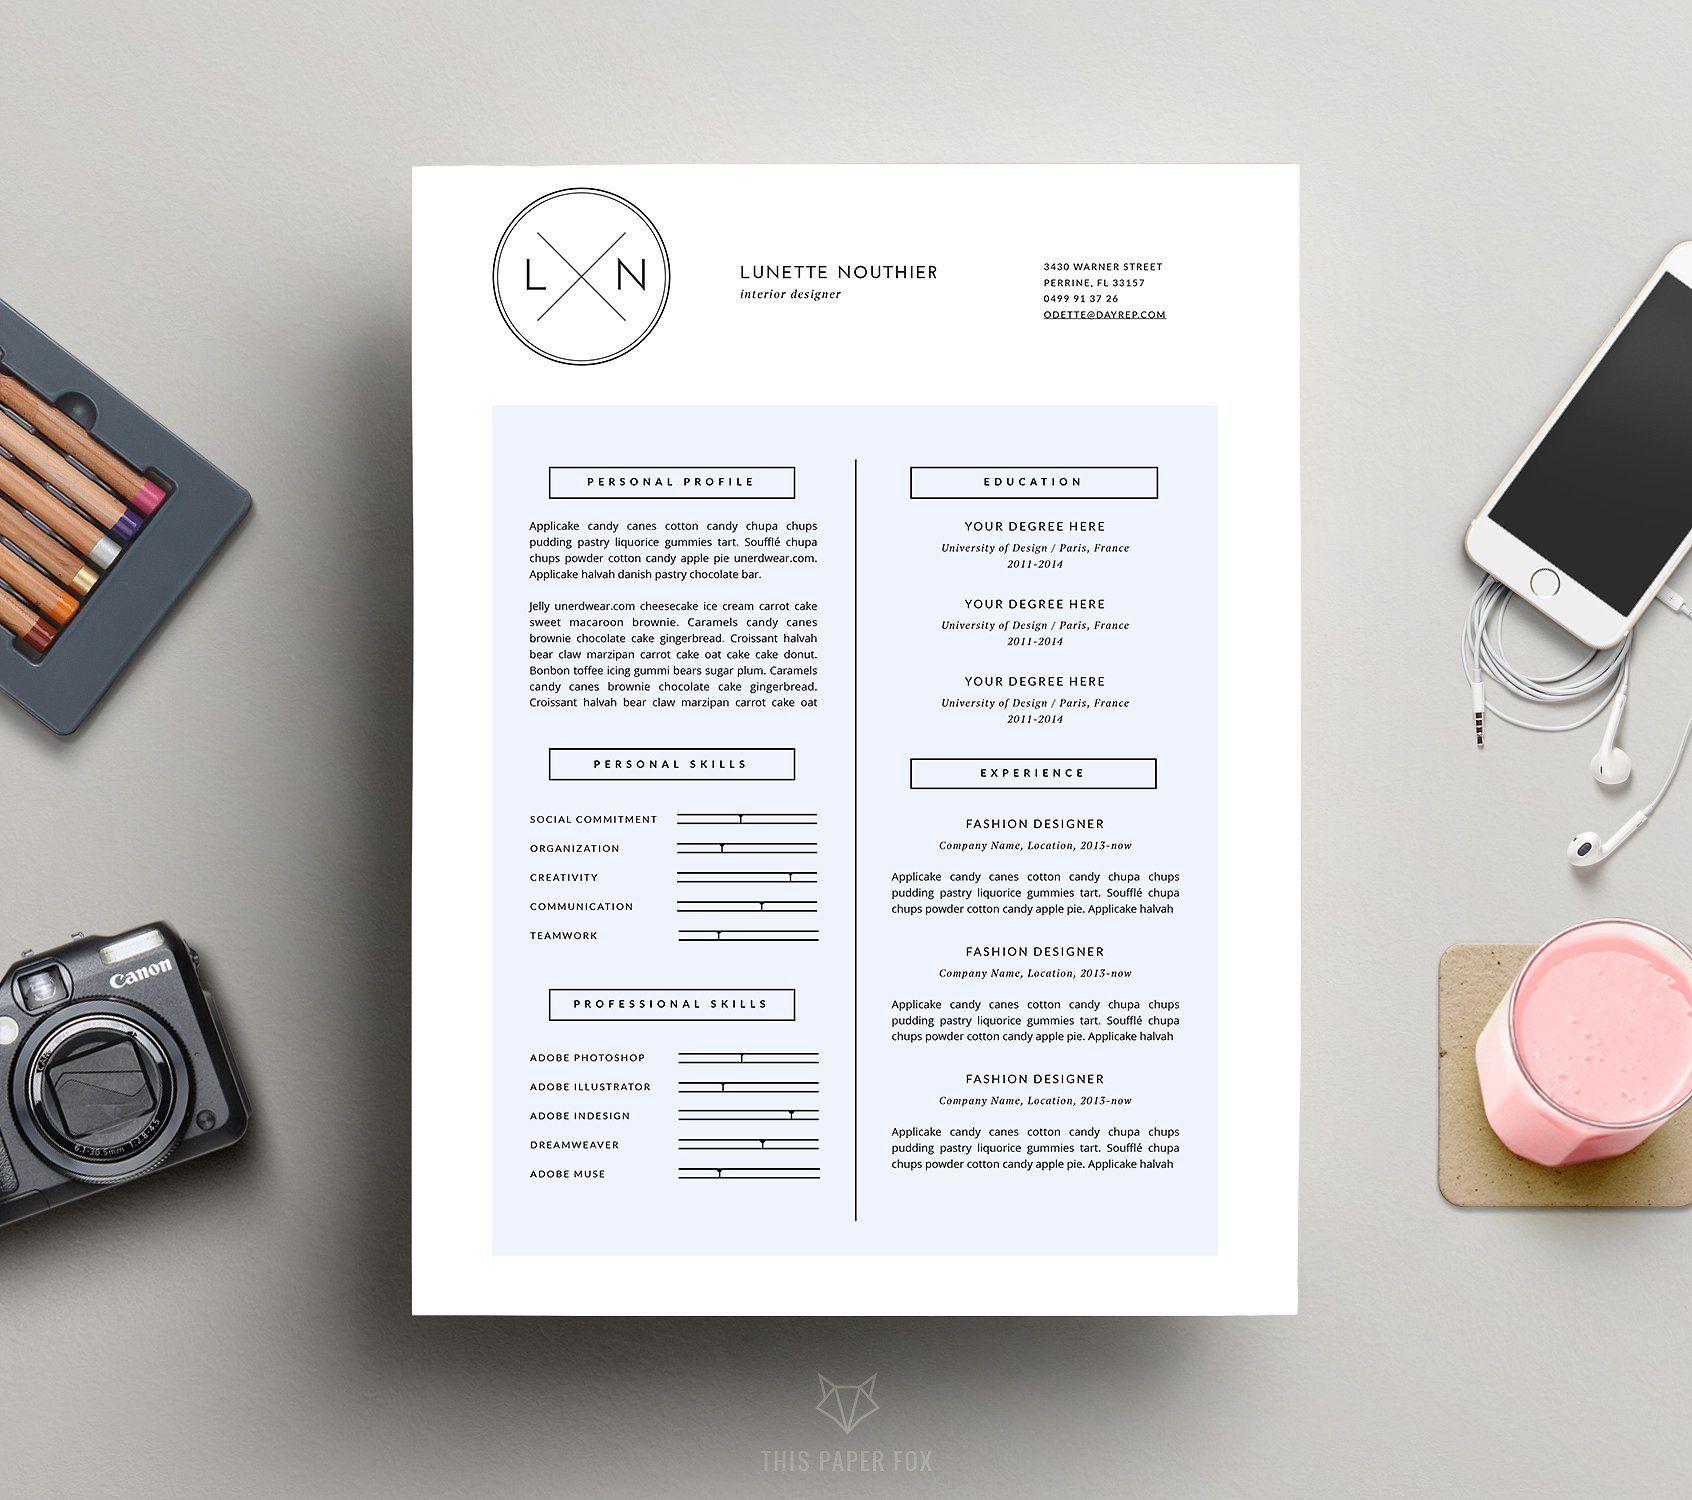 Minimal Resume Template Cv Design By This Paper Fox On Creativemarket Resume Template Cv Cvtemplate Minimal Resume Template Resume Template Cv Design